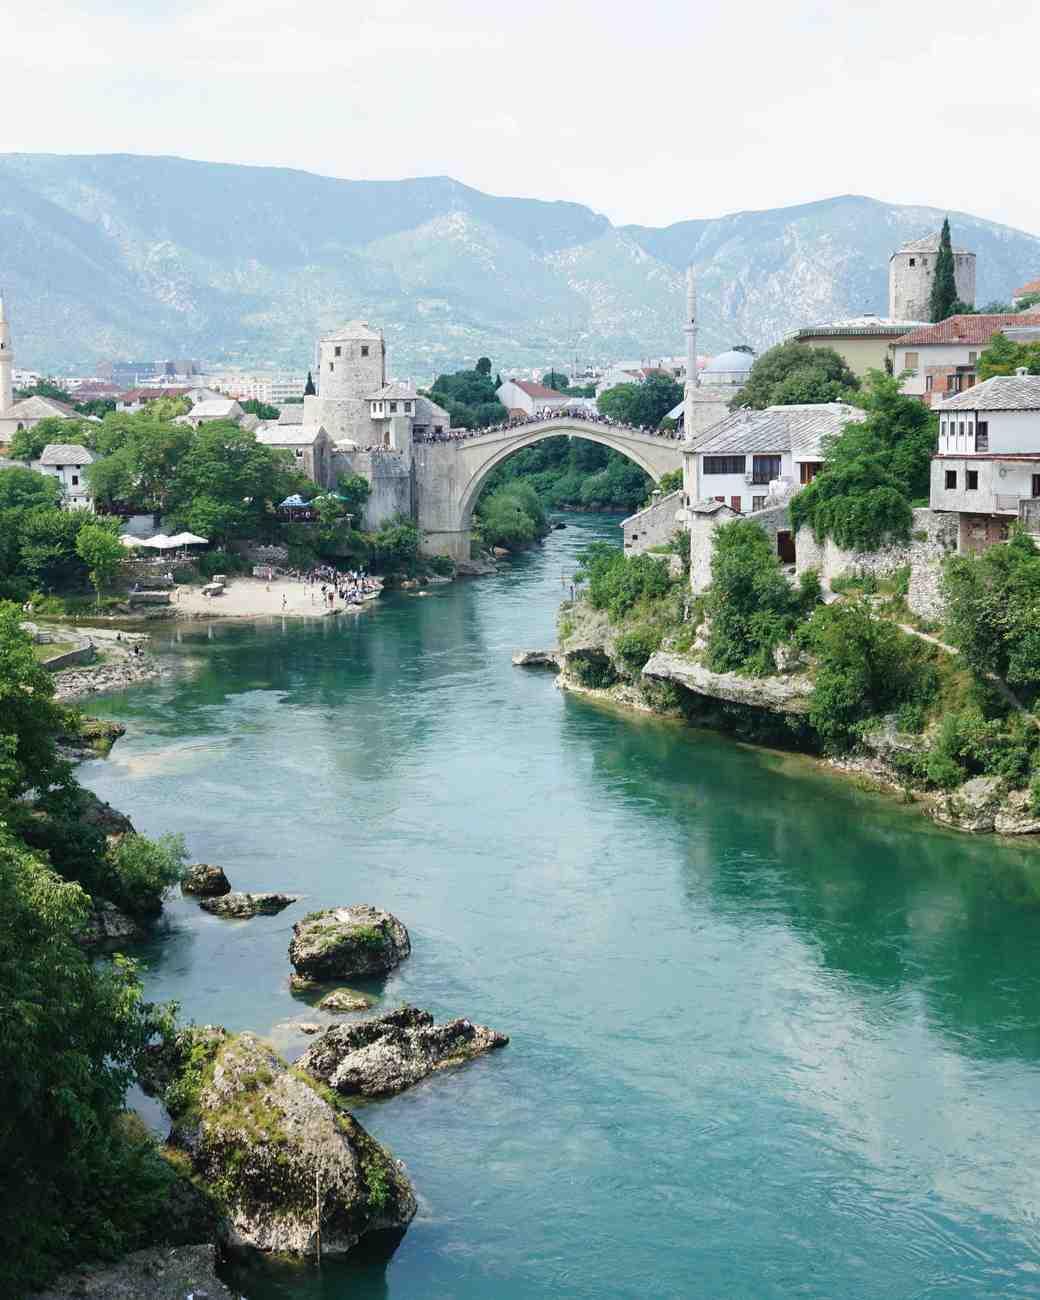 travel-honeymoon-diaries-mostar-bosnia-river-s112955.jpg